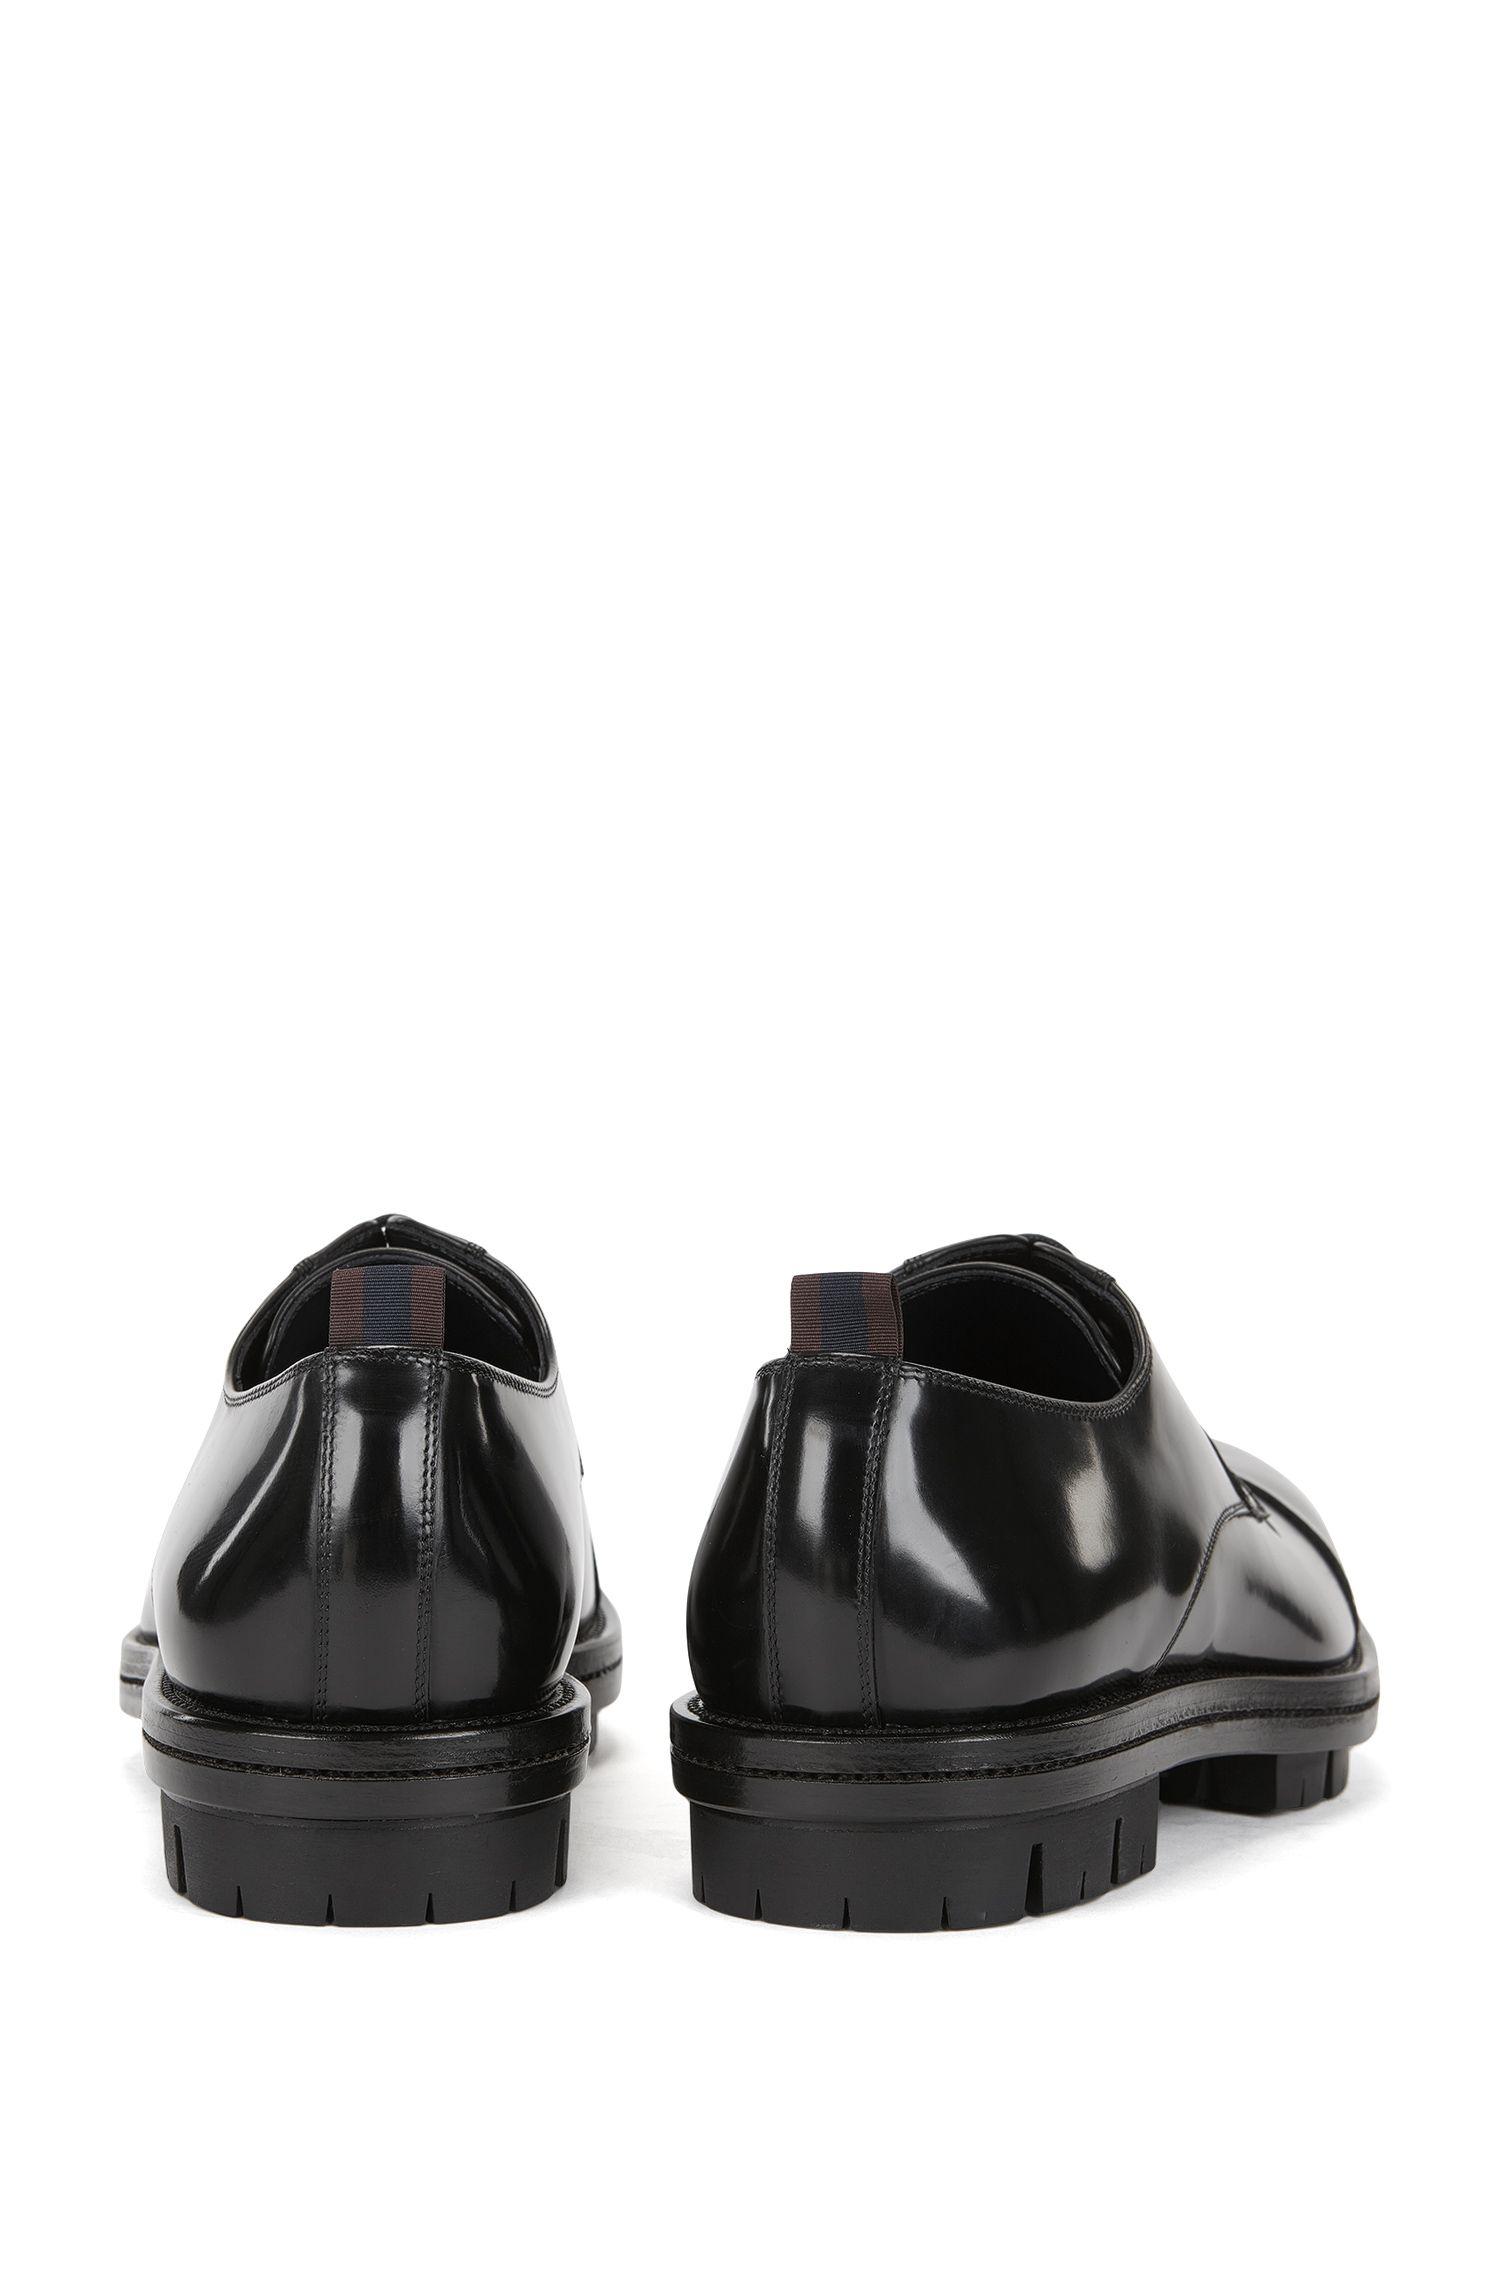 Patent Leather Shoe | Twist Derb Ct, Black